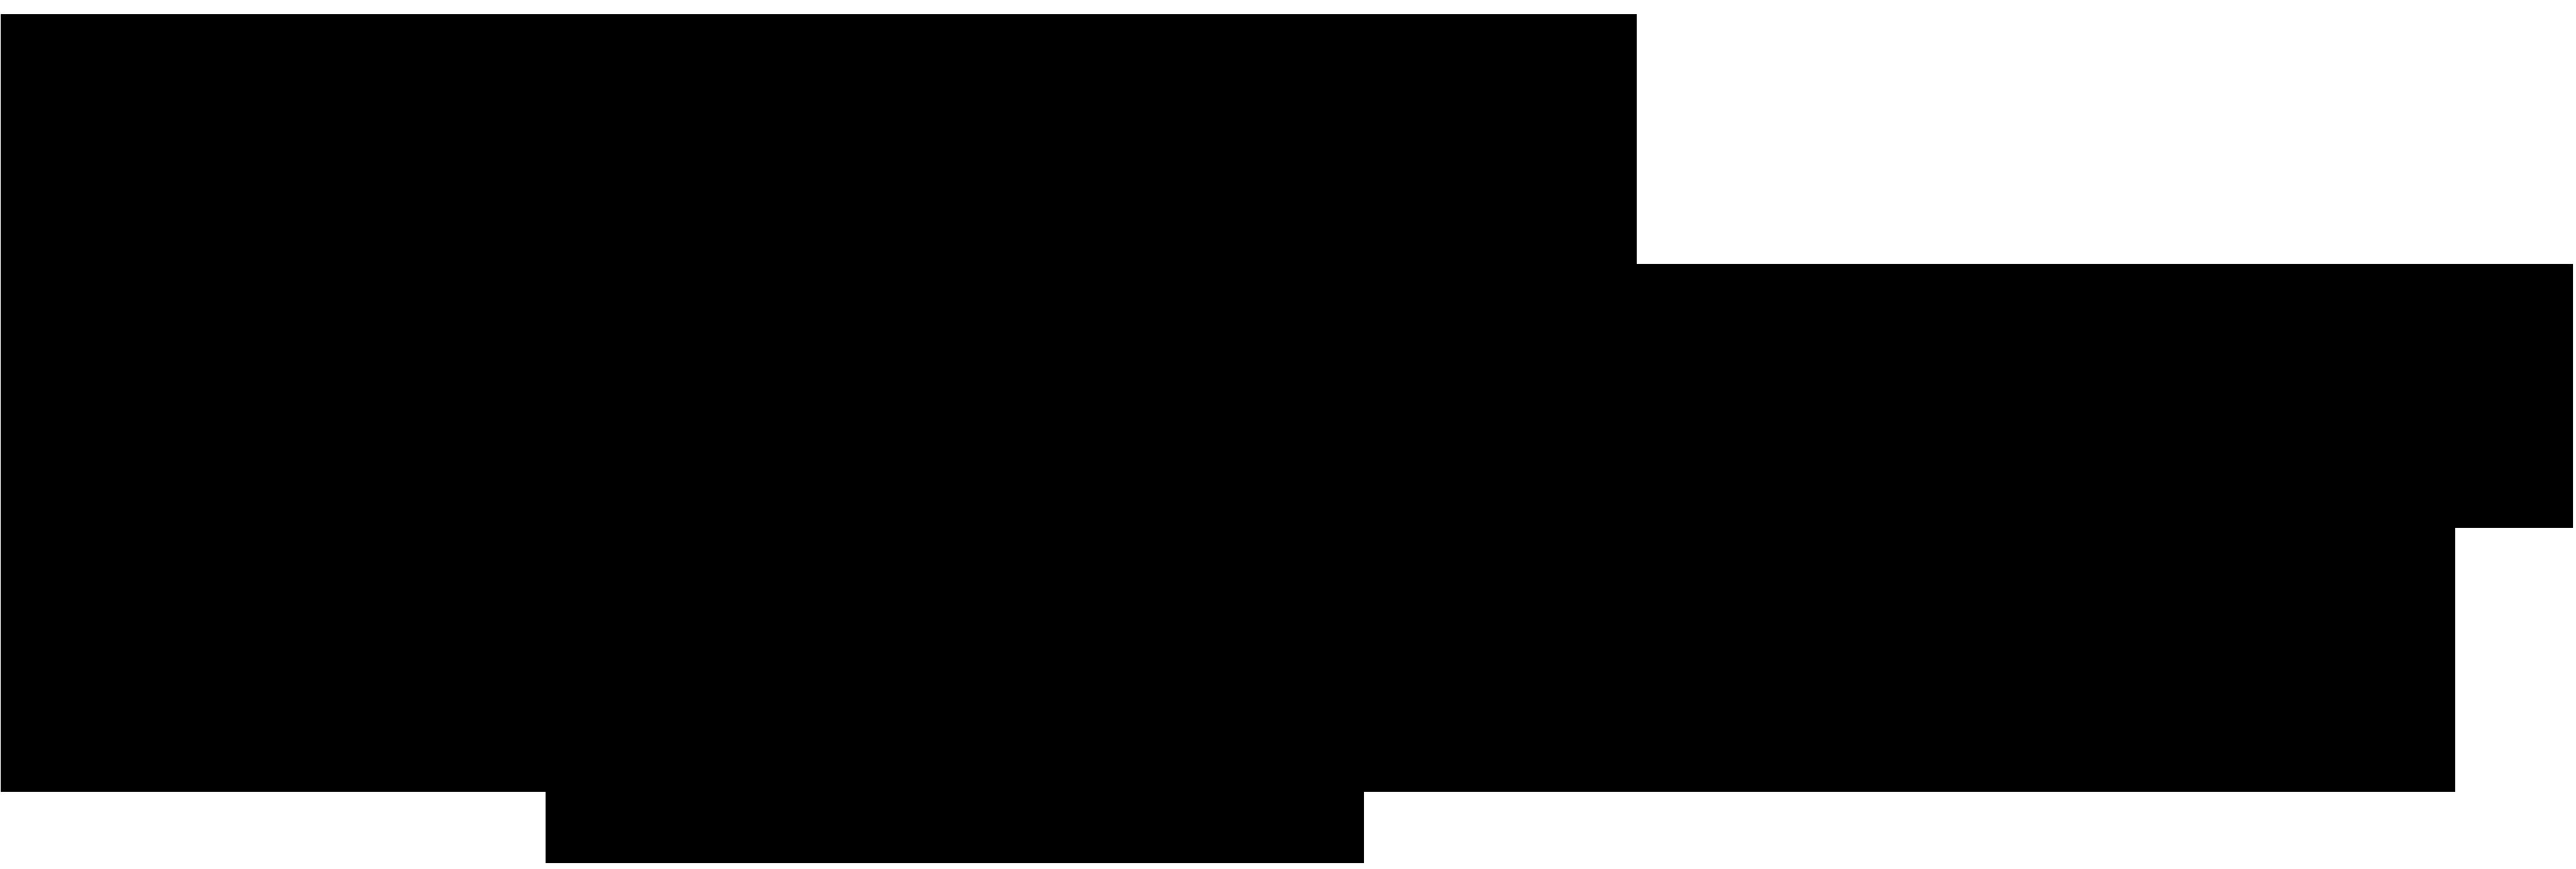 Nic Perry Logo